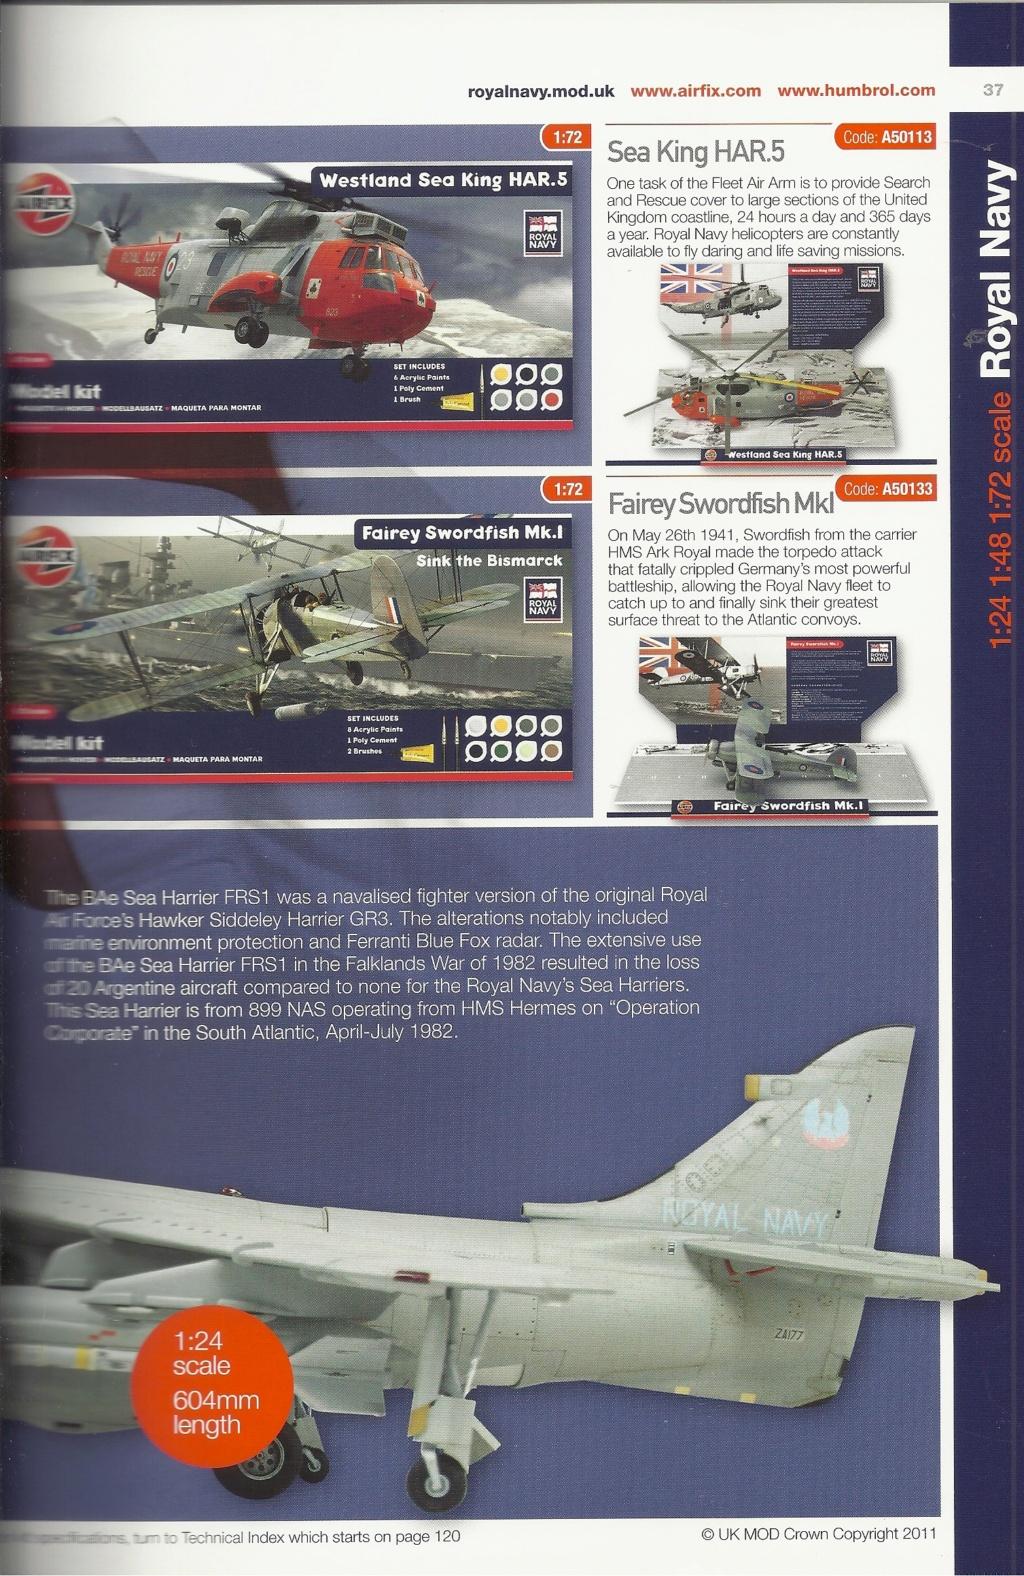 [AIRFIX 2013] Catalogue 2013 Airf1488